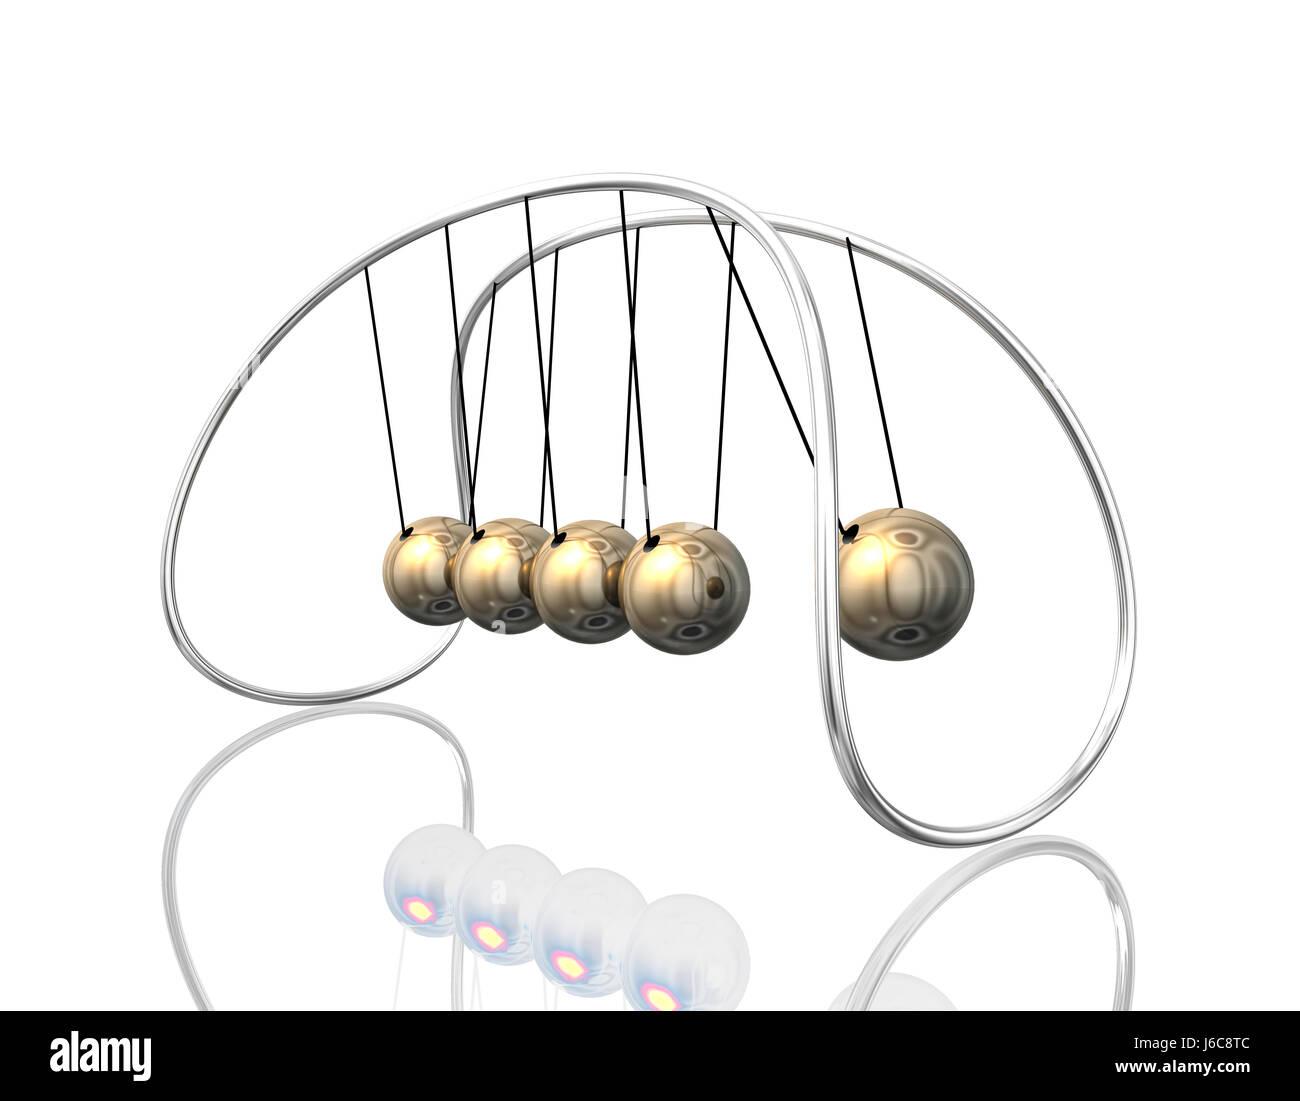 science pendant bright shiny pendulum gravity physics newton silver